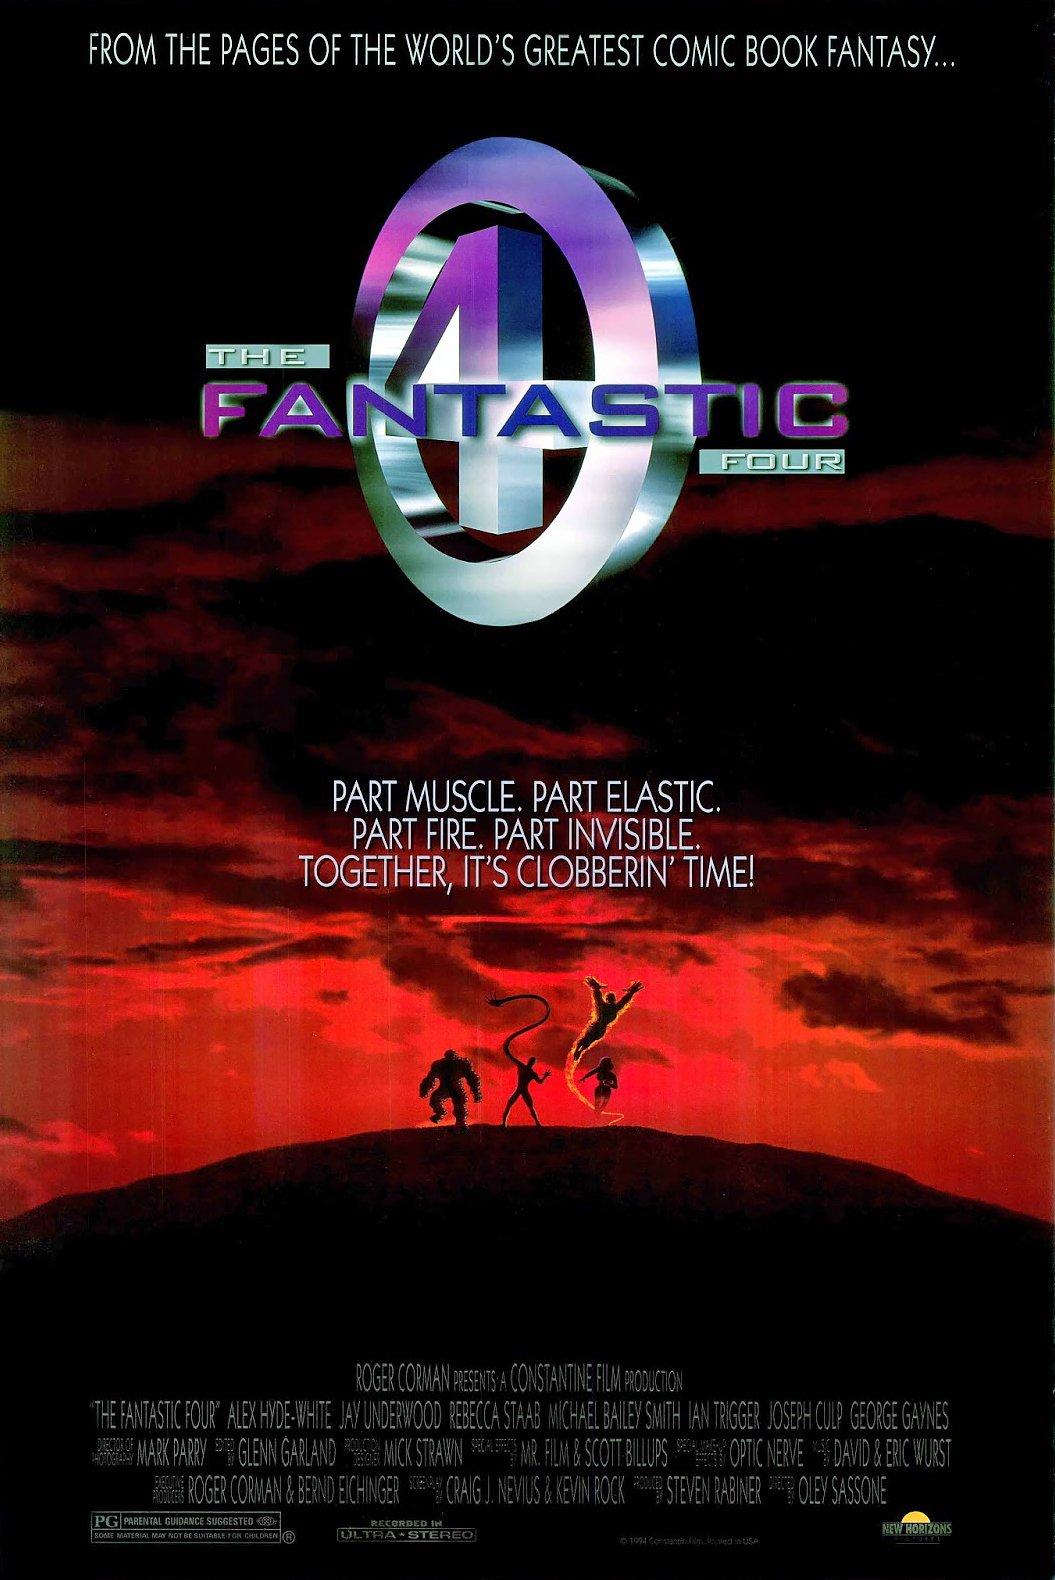 Póster de The Fantastic Four (1994). Imagen: moviemicroreview Twitter (@moviemicrorw).